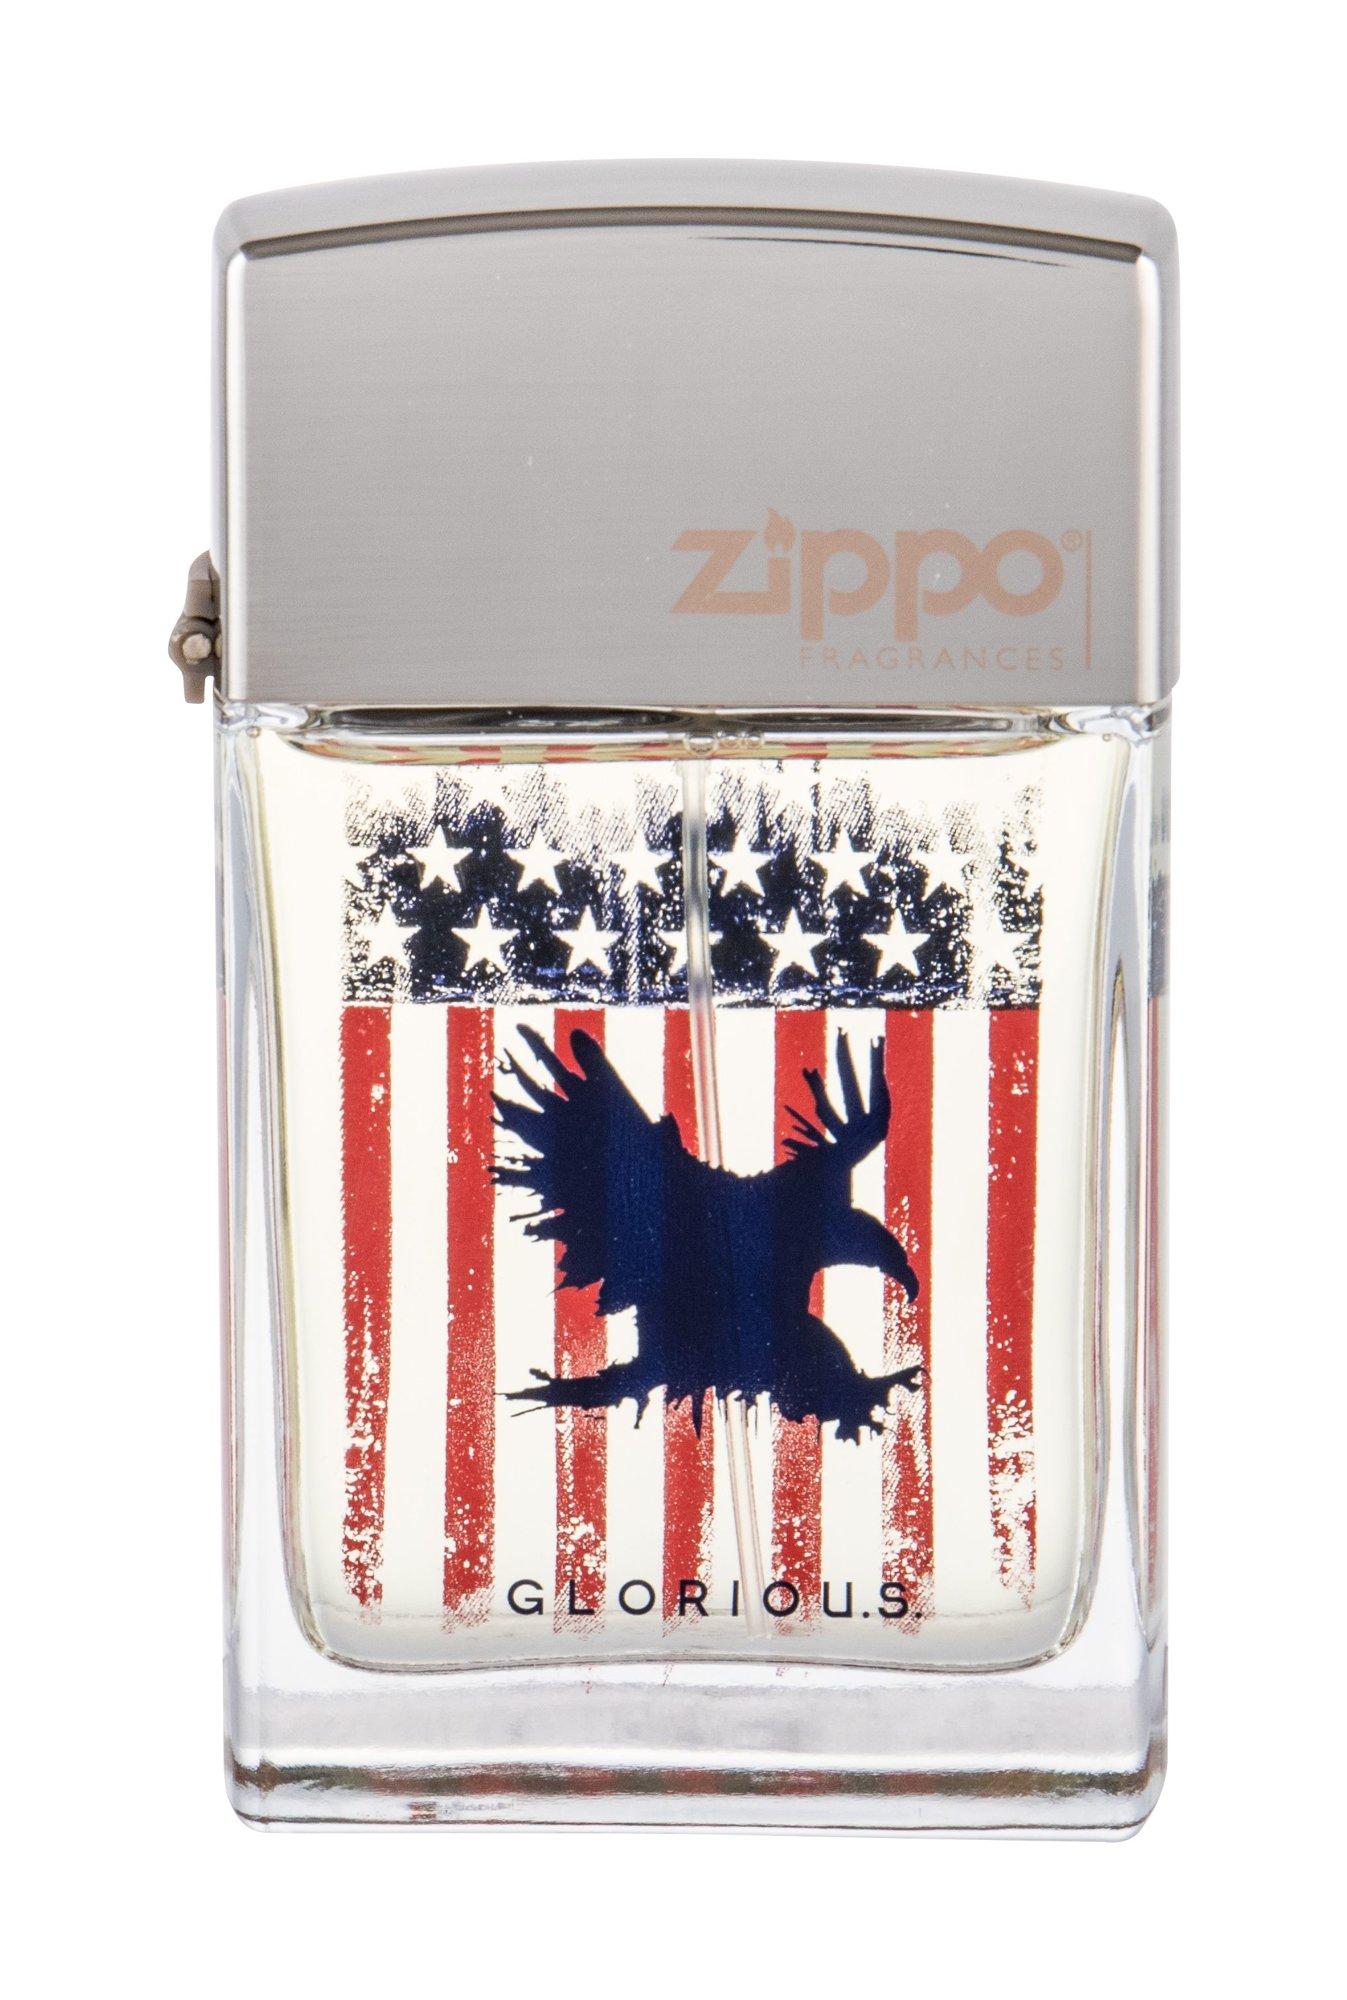 Zippo Fragrances Gloriou.s., Toaletní voda 75ml, Tester